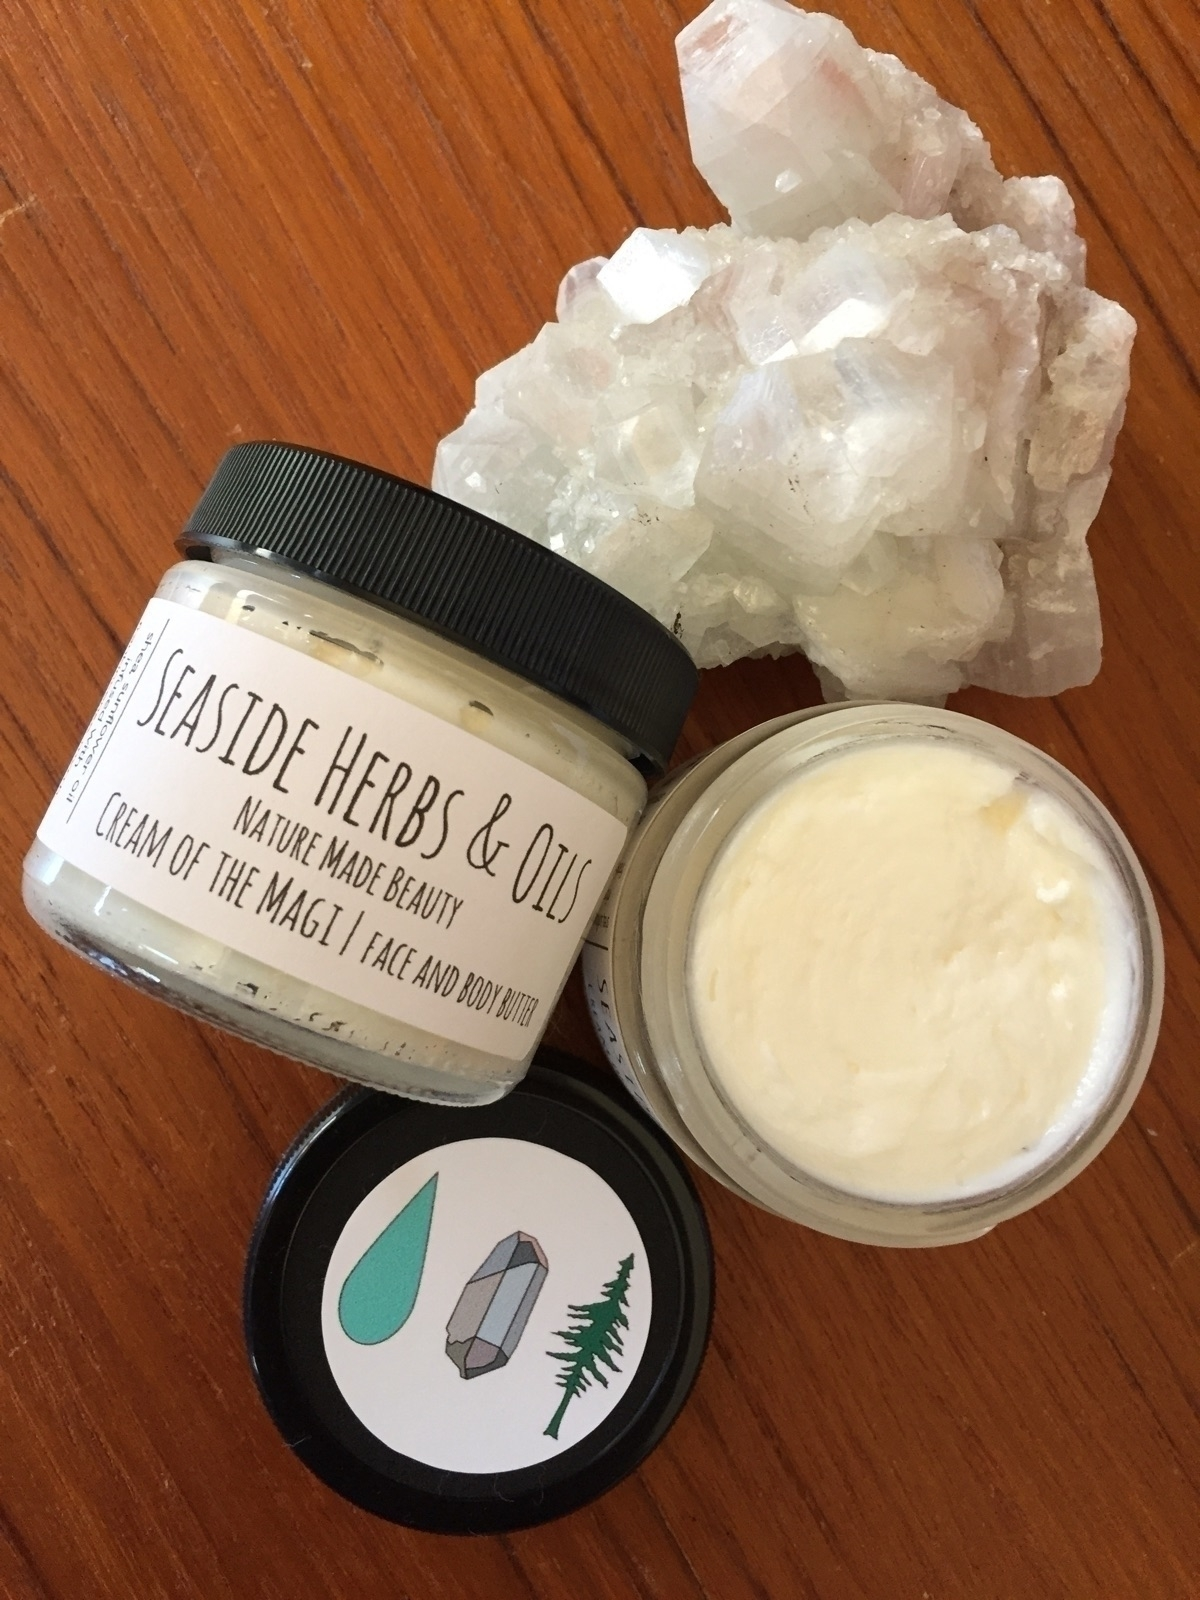 Cream built sensitive skin irri - seasideherbsandoils | ello